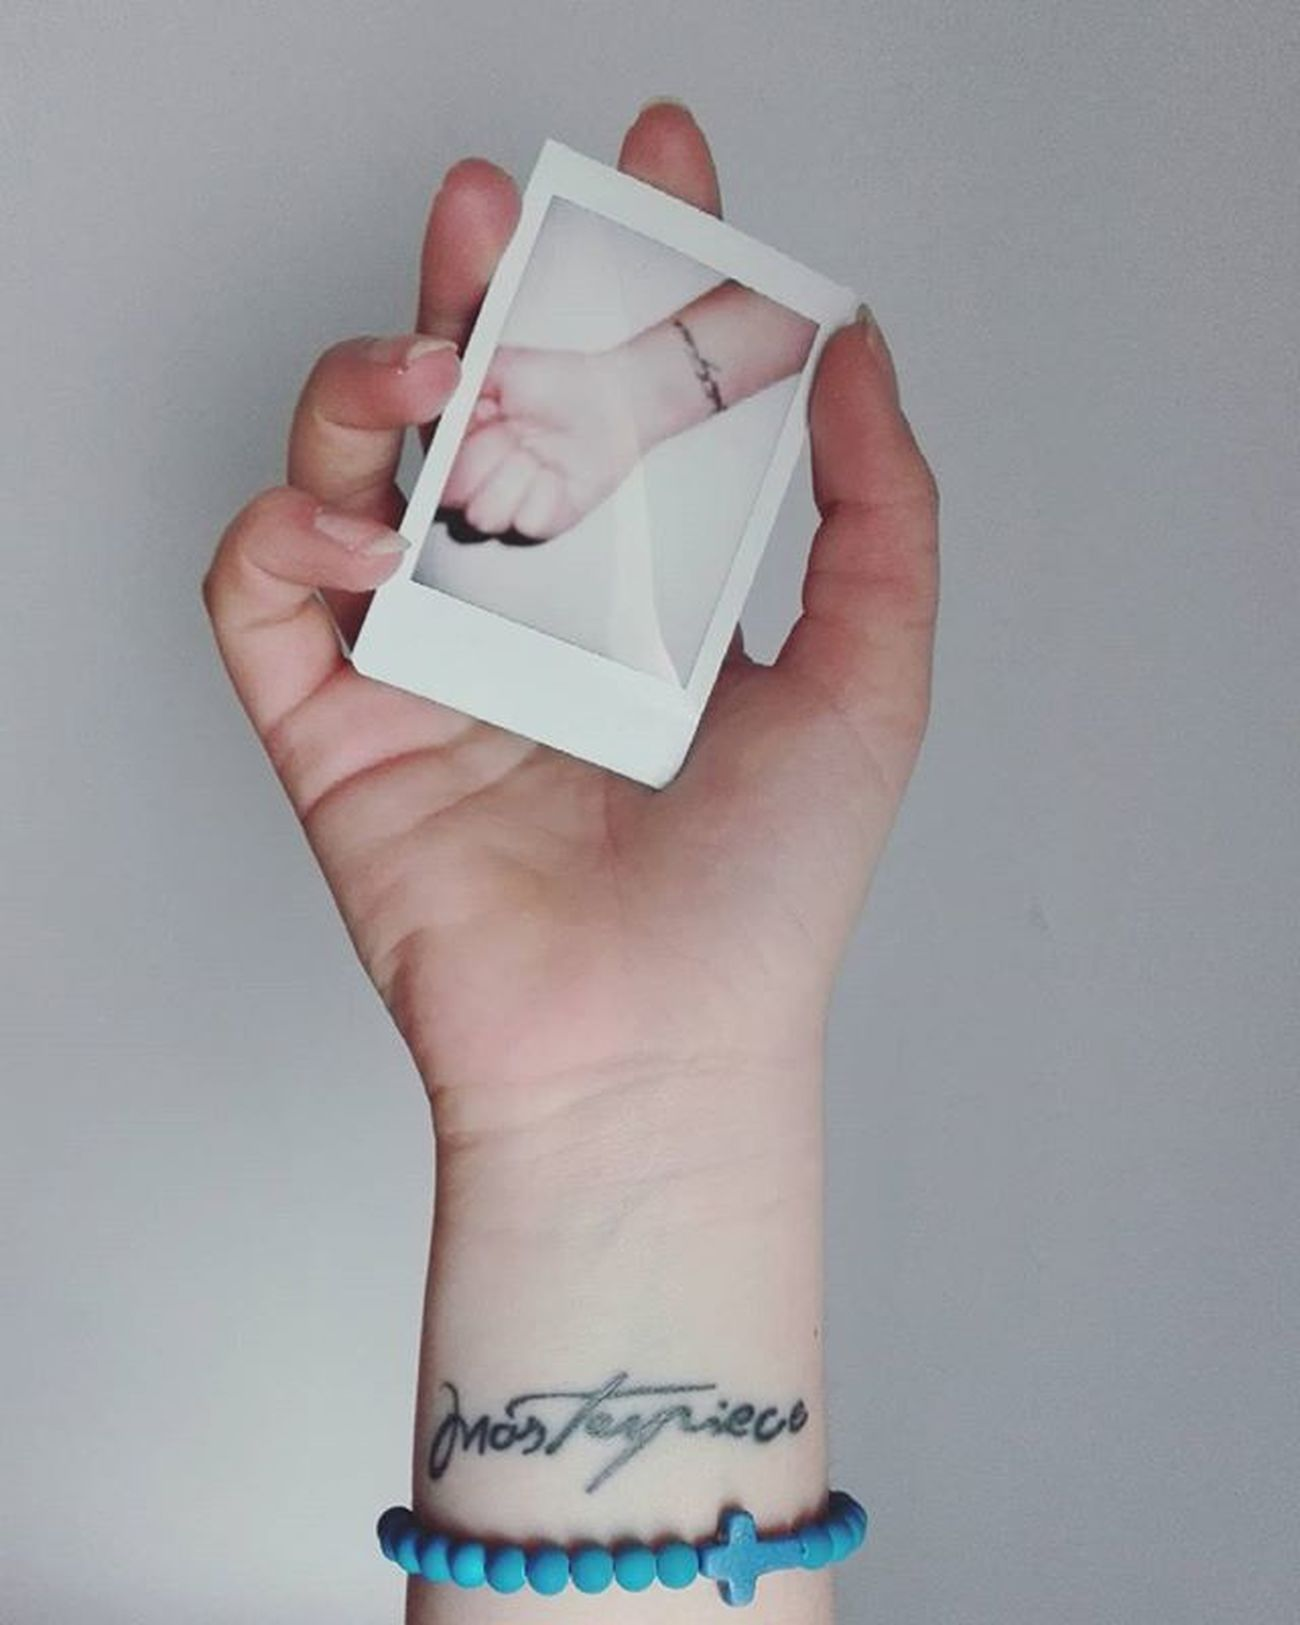 Second tattoo, waiting for a third Tattoo Masterpiece Polishgirl Inspiration Wrist Instax Tatuaż Sunday Loveit Tumblrgirl Art Bodyart Weheartit Polishtattoo